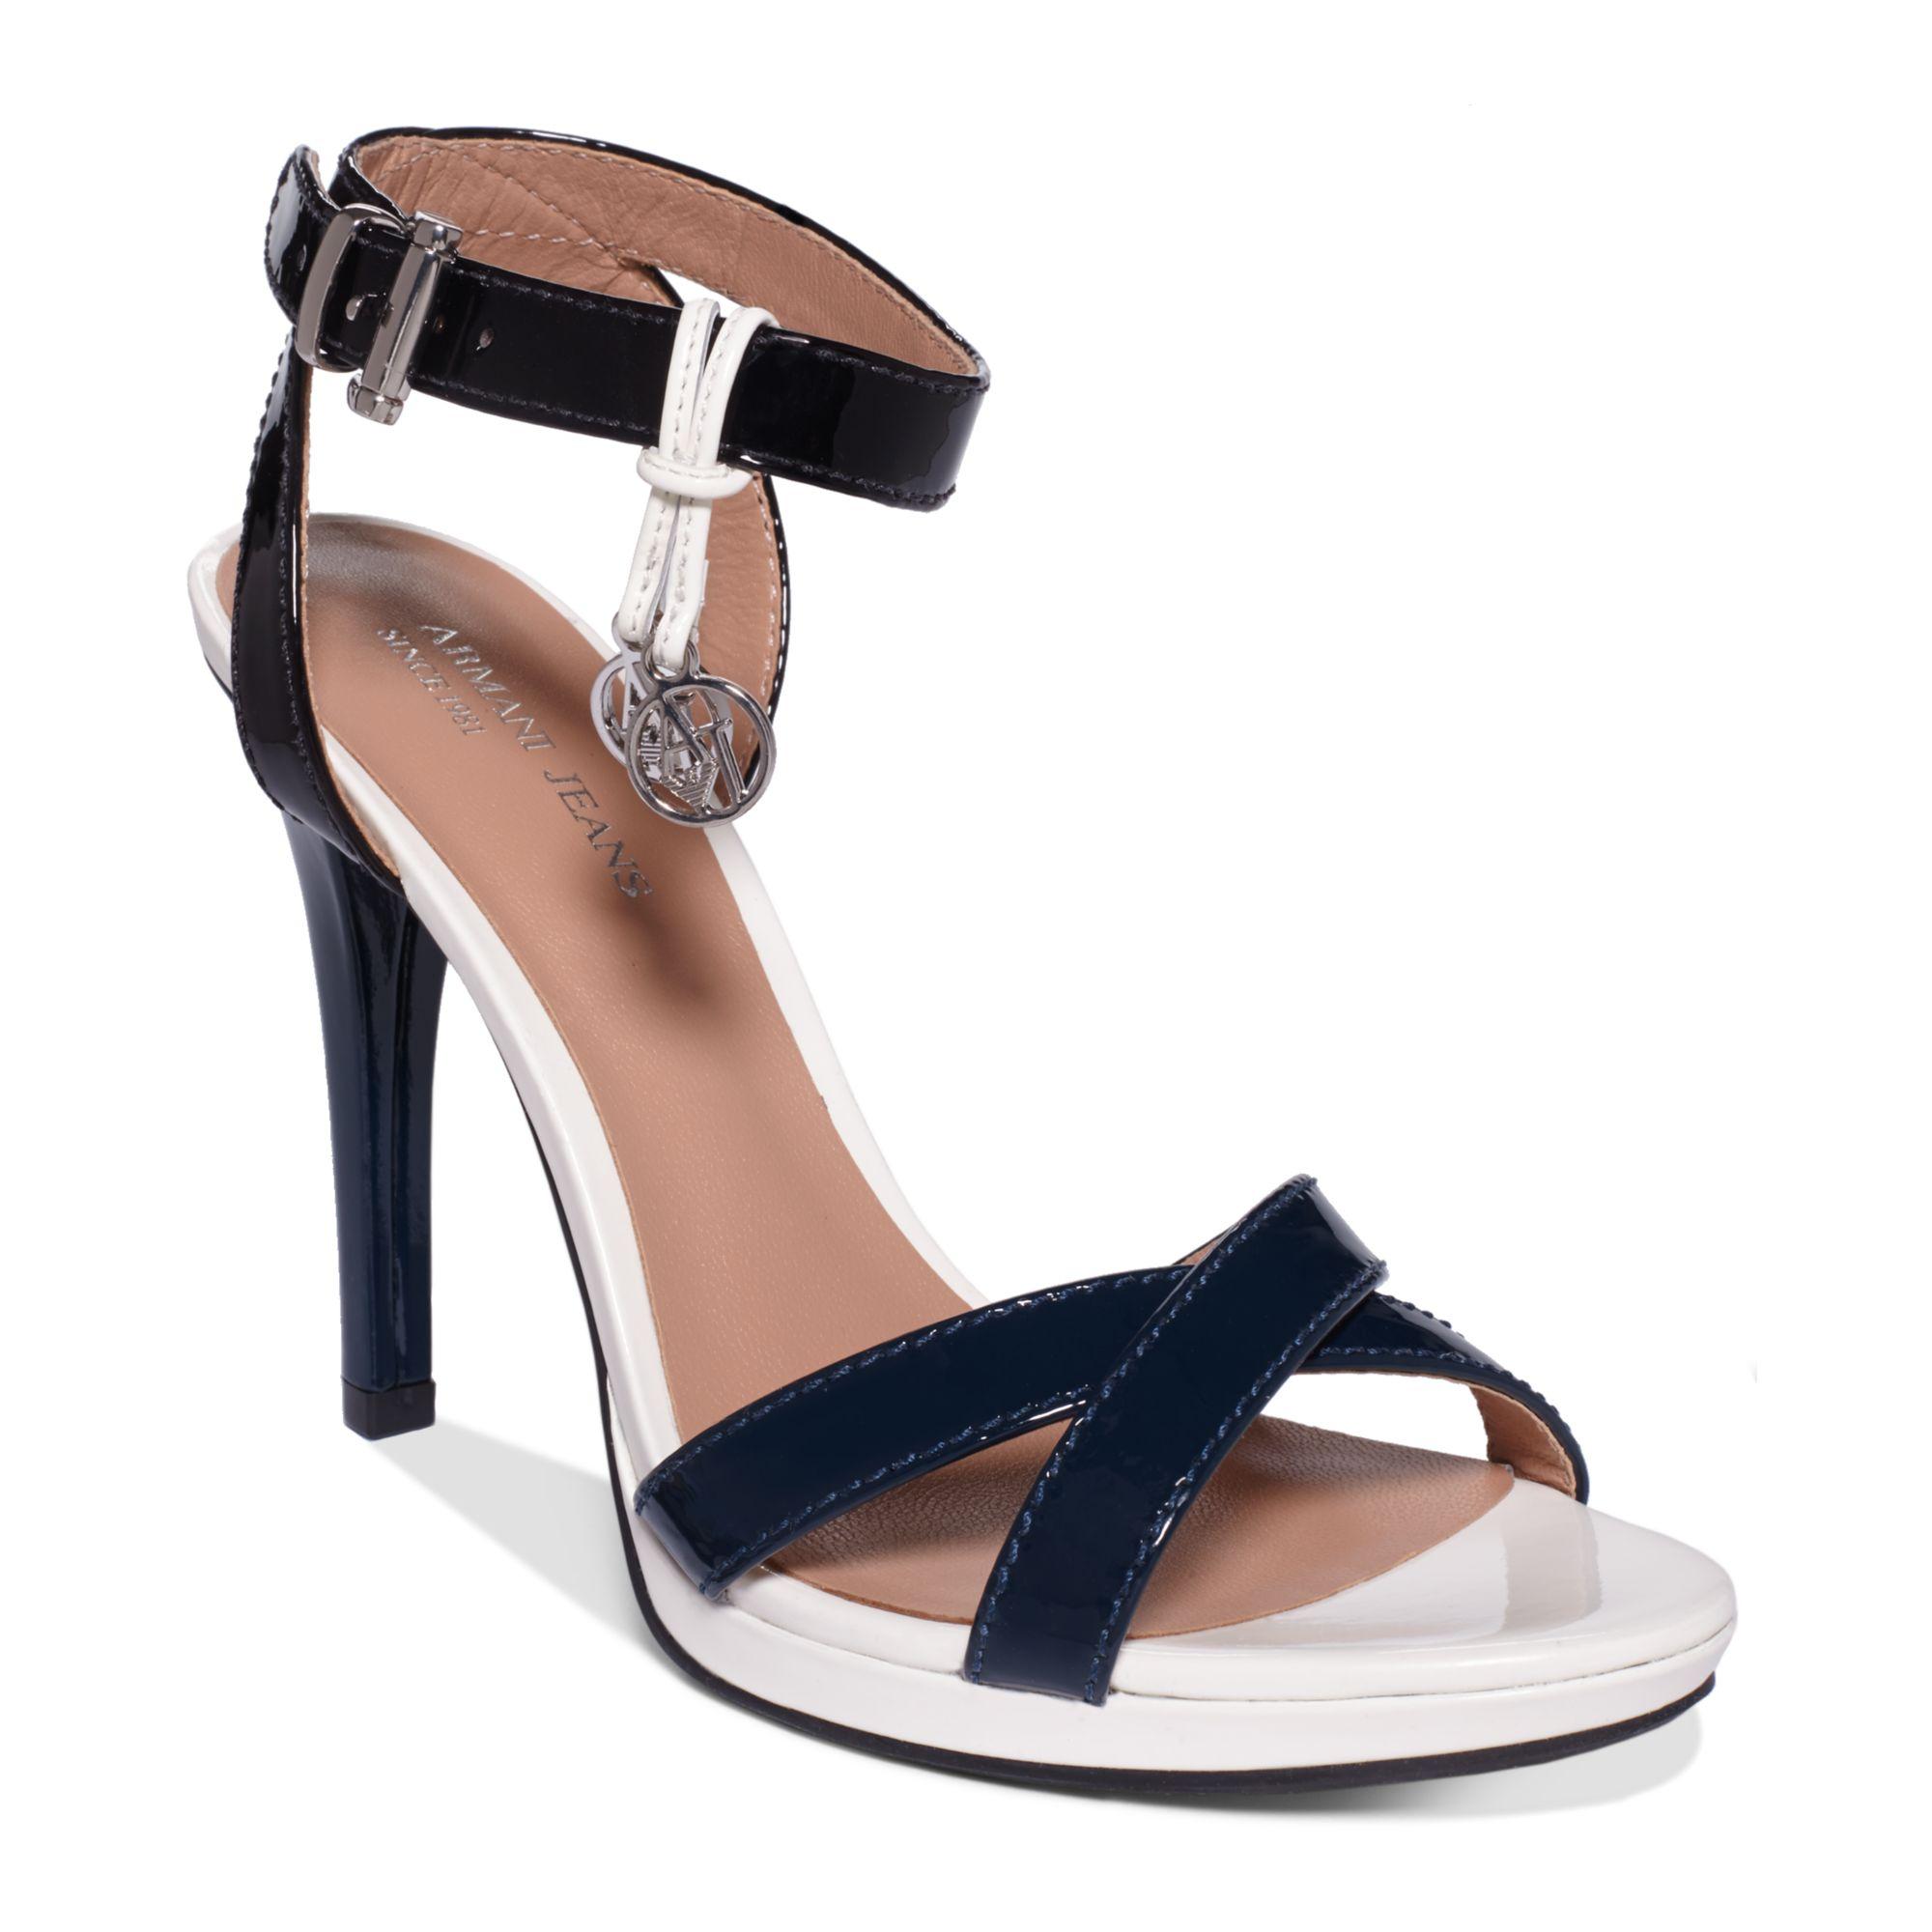 1d20170d9dc2 Lyst - Armani Jeans Womens High Heel Sandals